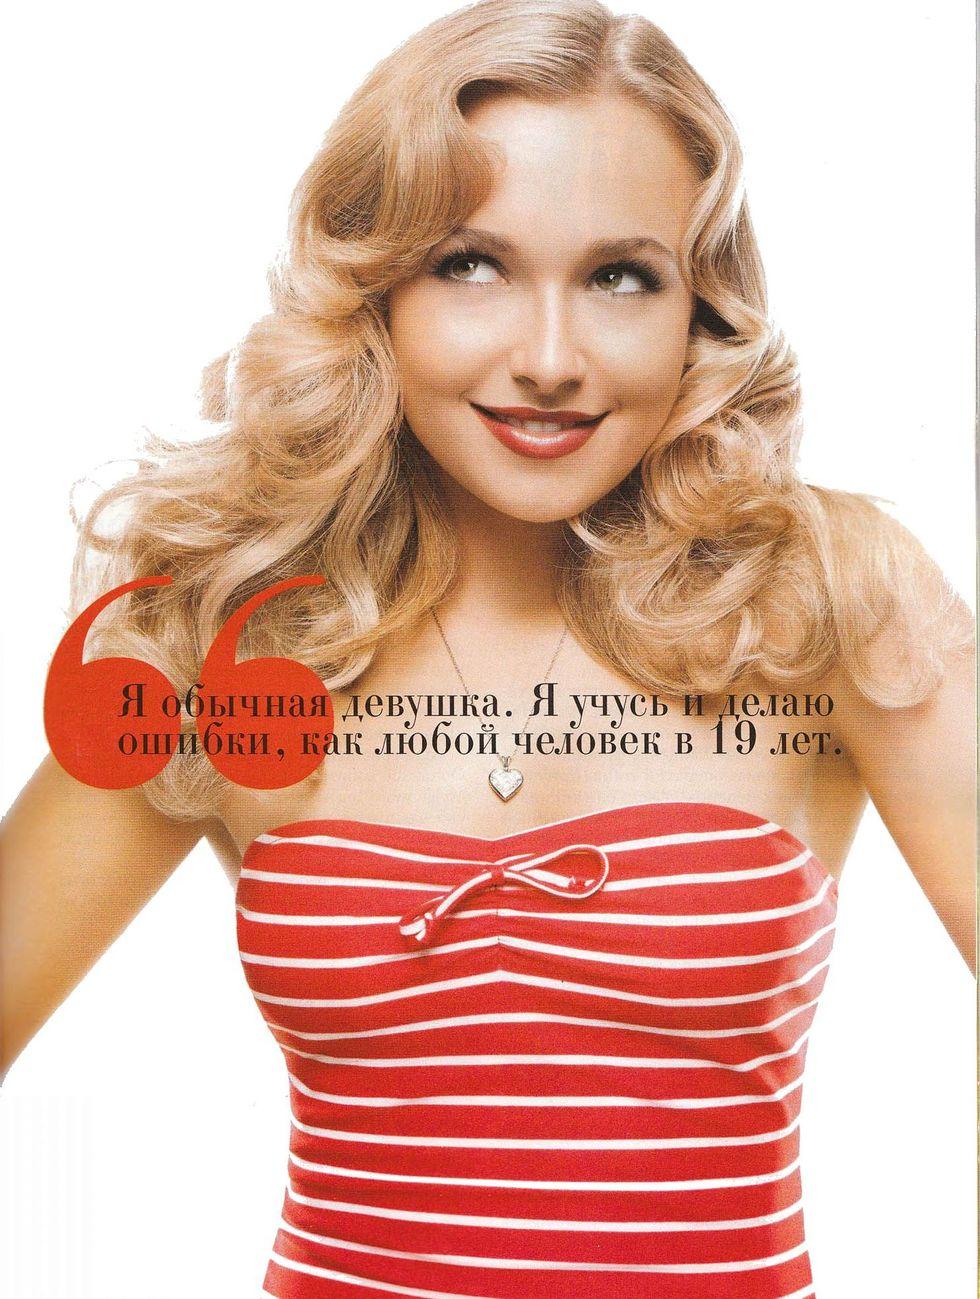 hayden-panettiere-mini-magazine-february-2009-01